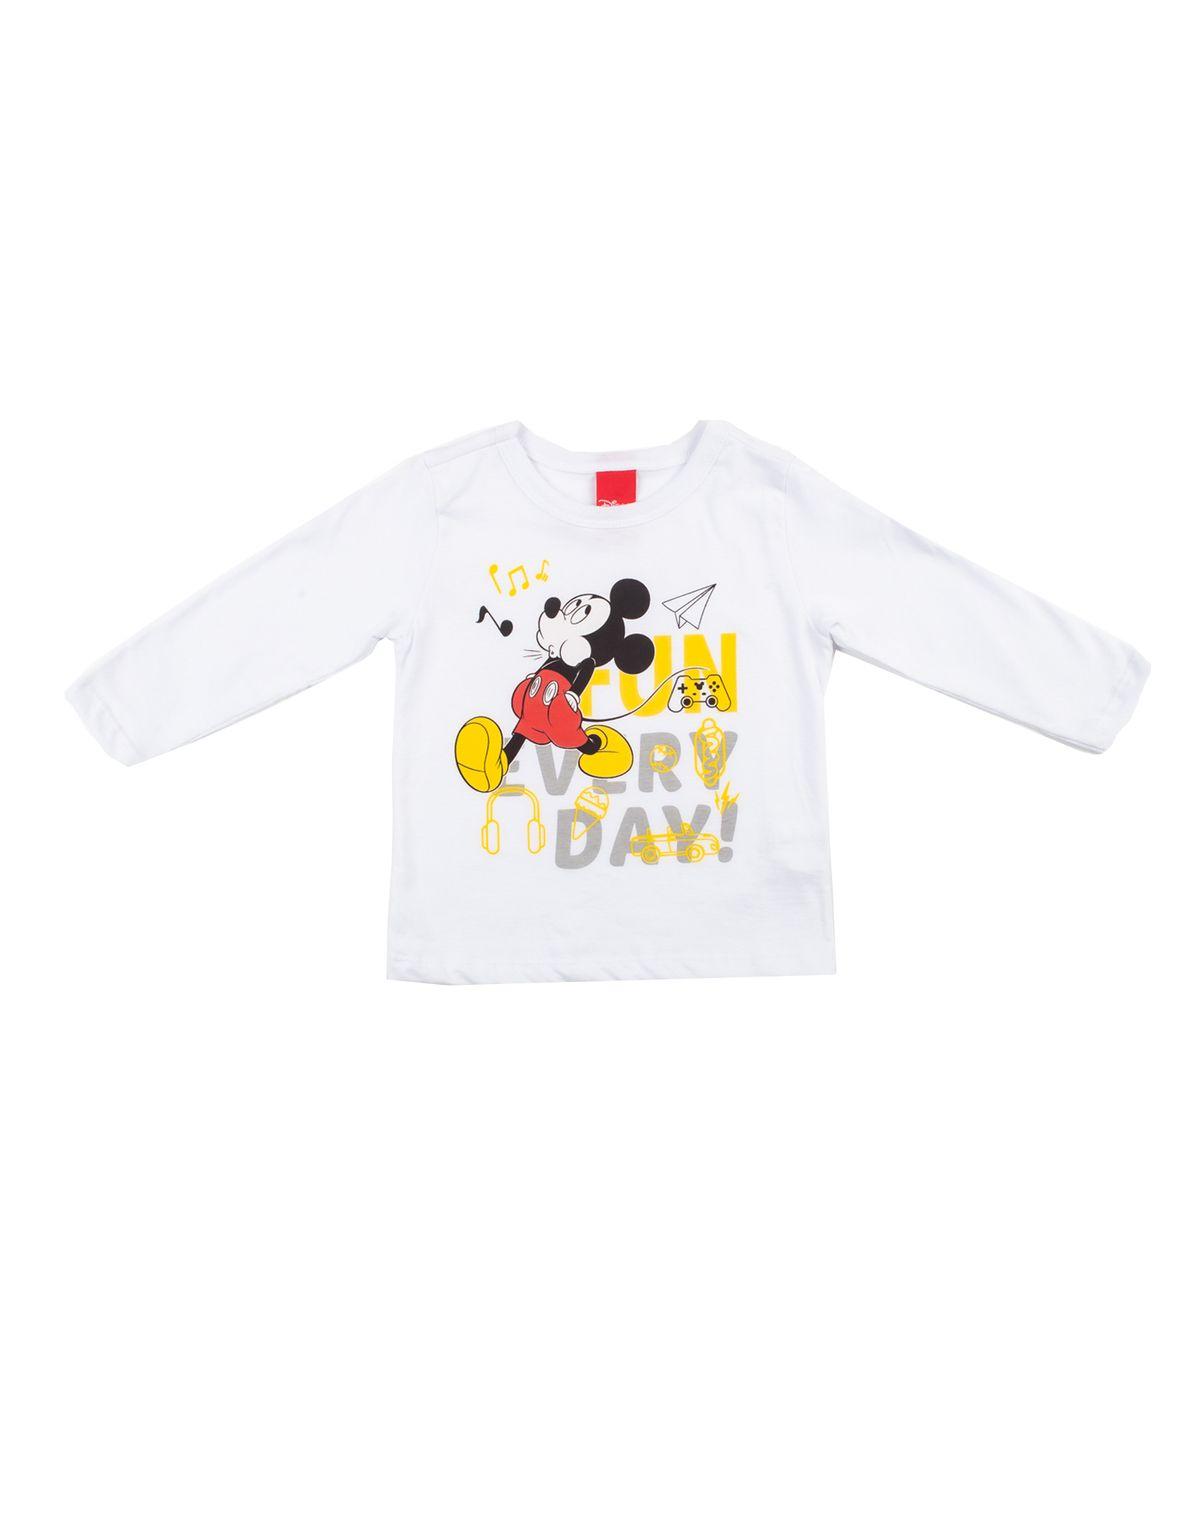 581037002-camiseta-manga-longa-bebe-menino-mickey-mouse-branco-2-815